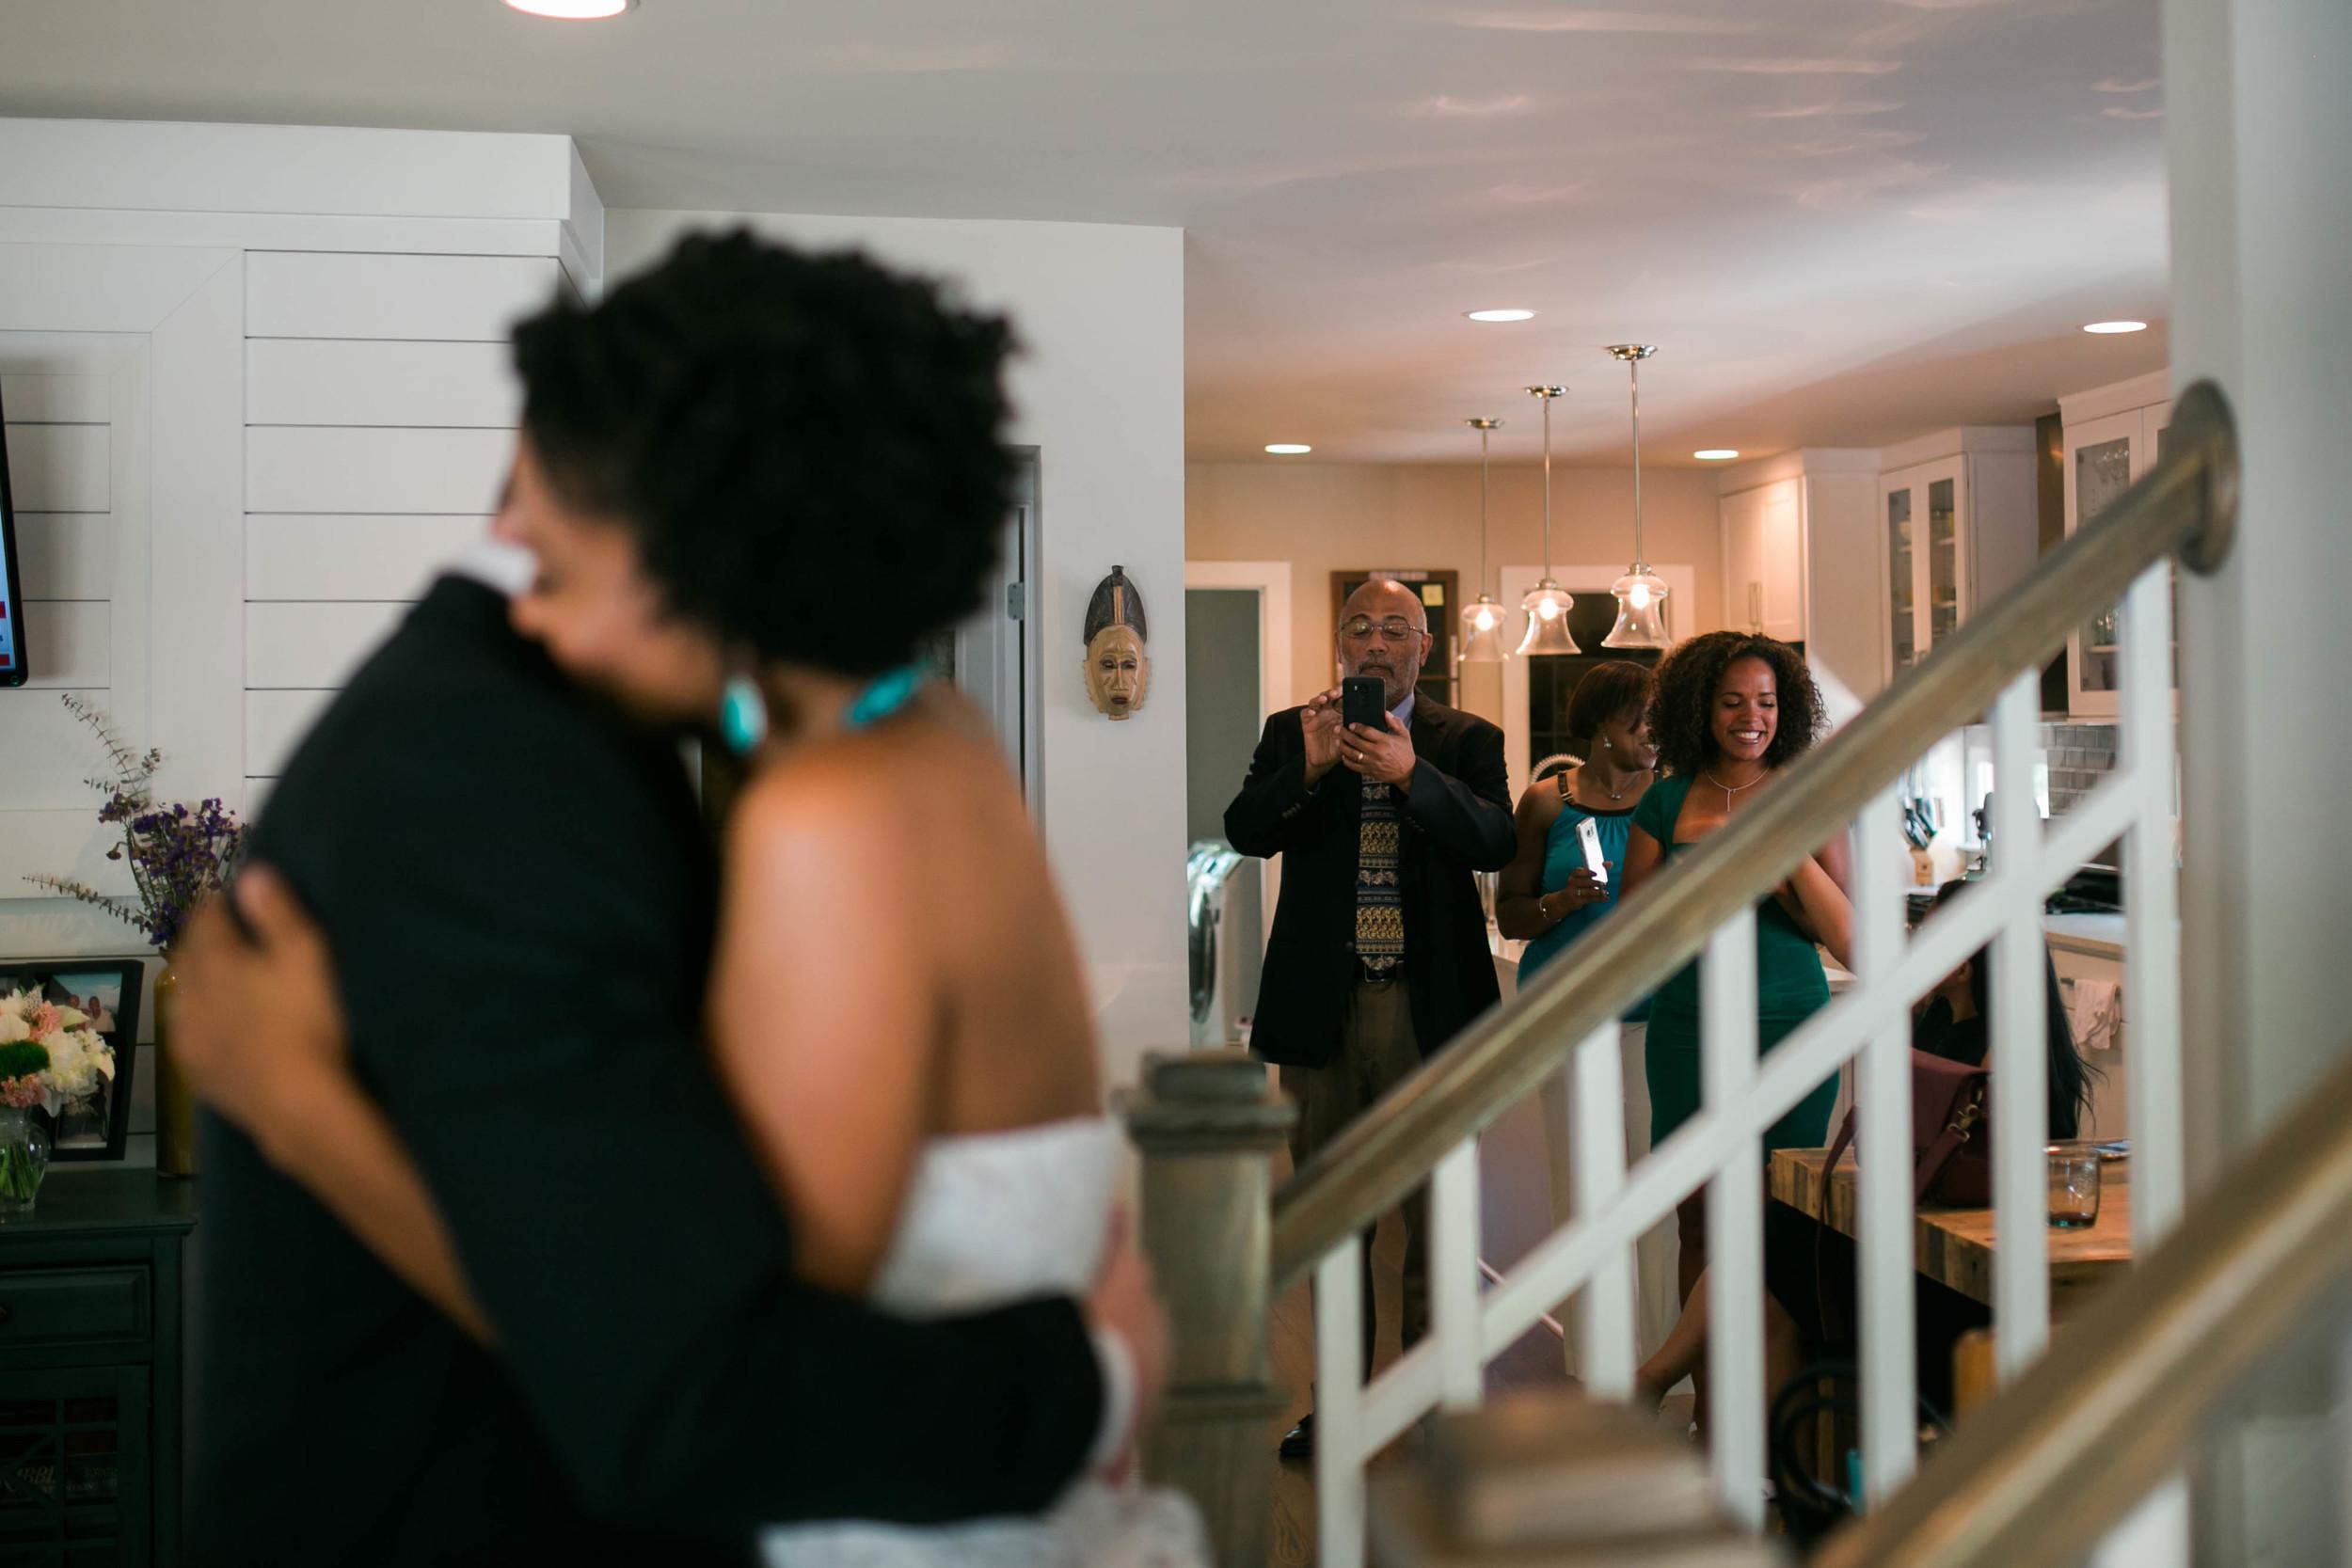 Dekalb-County-Courthouse-Wedding-Photos-Kiyah-C-Photography-26.jpg